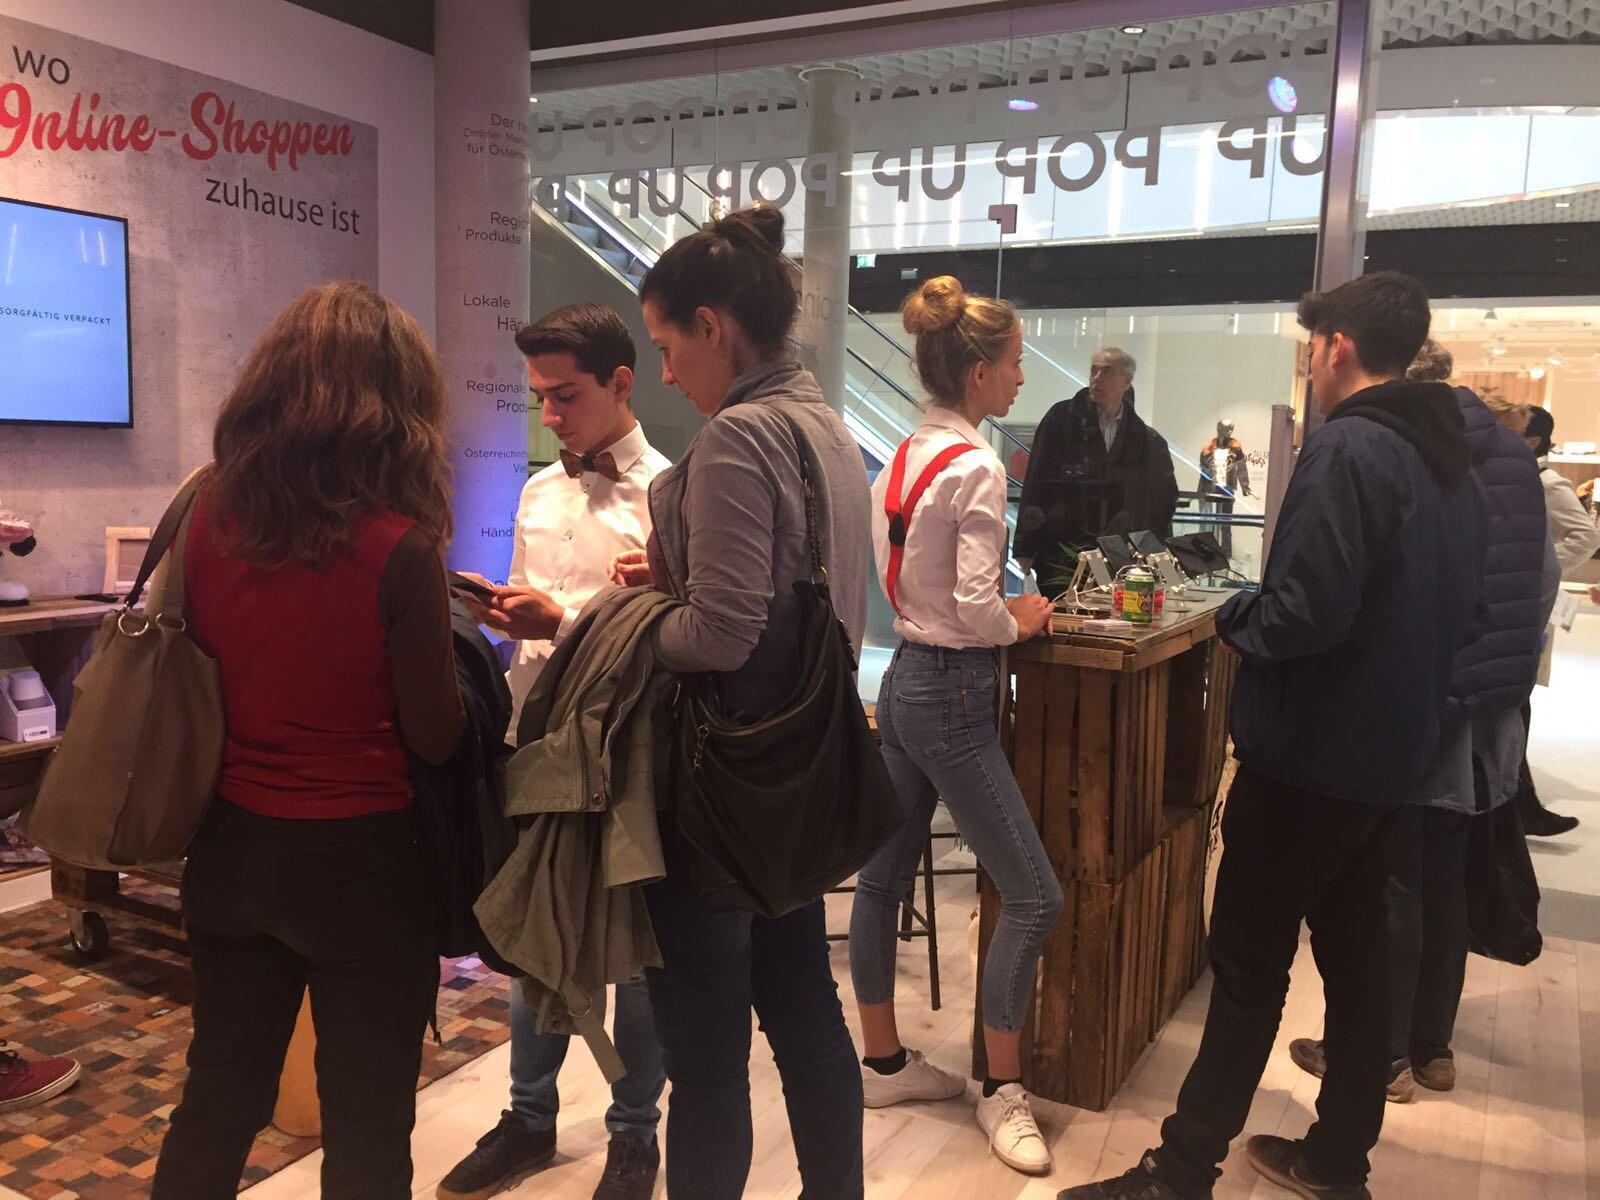 Shöpping.at Pop Up Eröffnung mit cinnamon Hospitality & Promotion, Bildrechte: @cinnamon GmbH